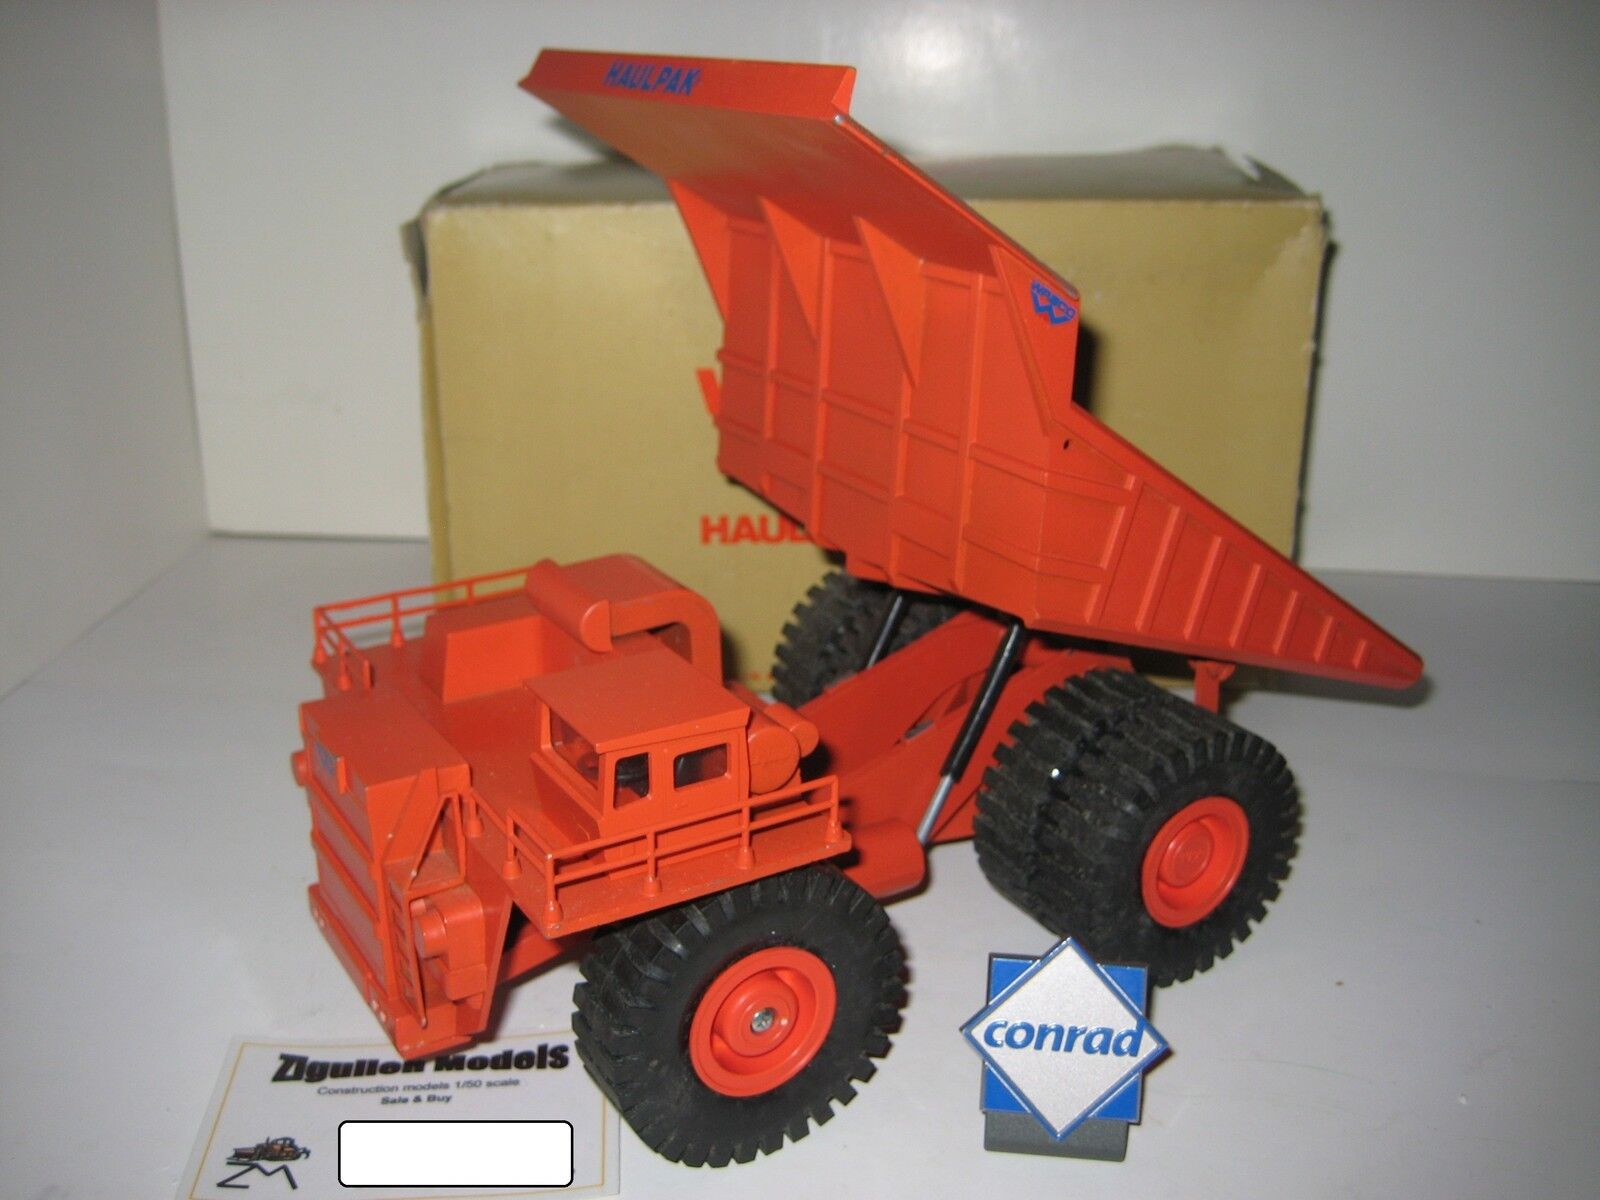 Wabco haulpak camiones de volteo rojo Gescha 1 50 OVP rareza